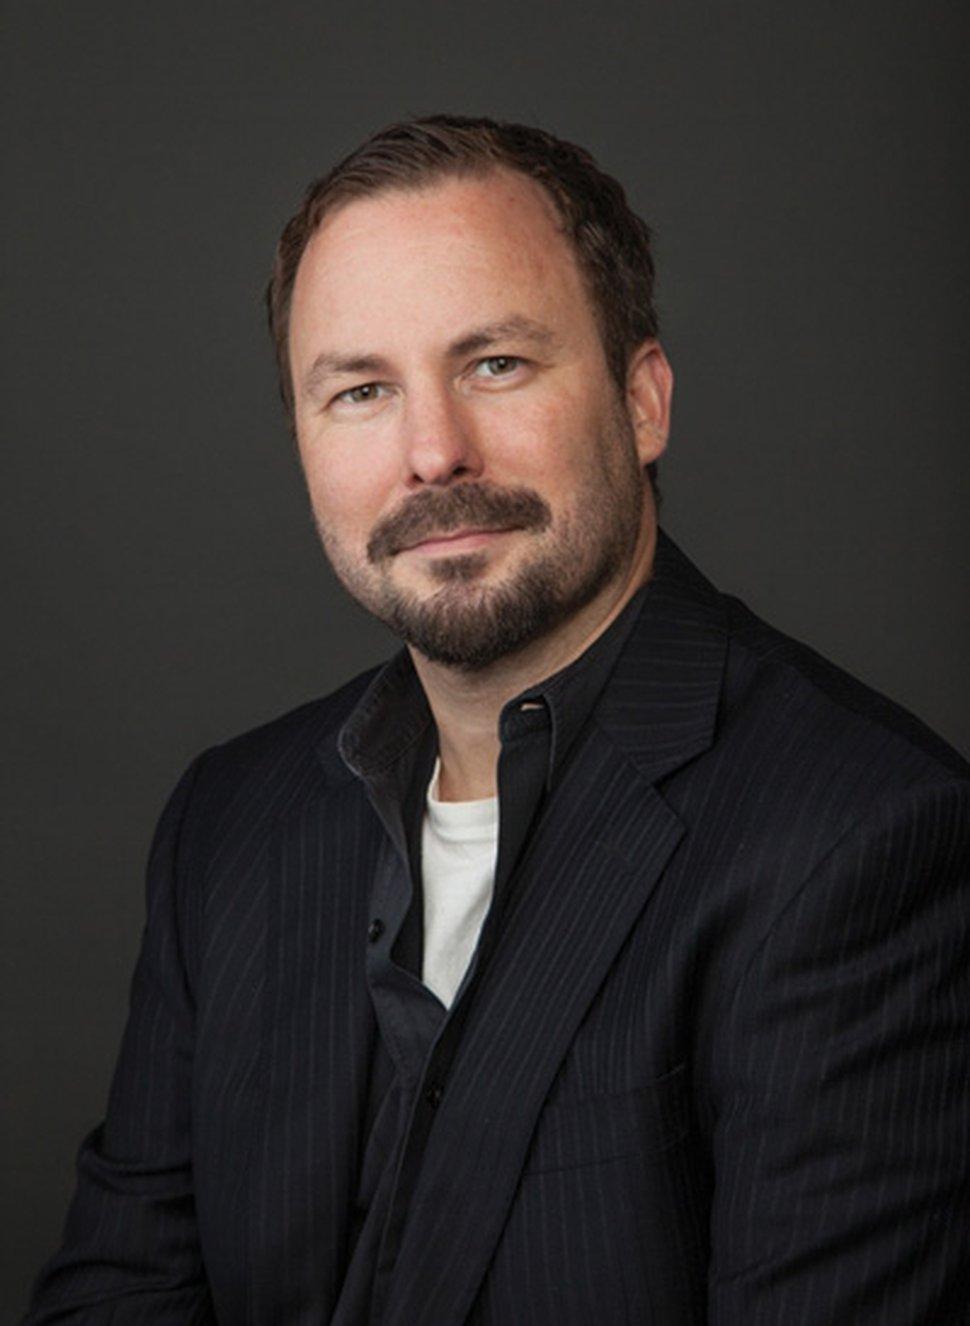 Peter Reichard